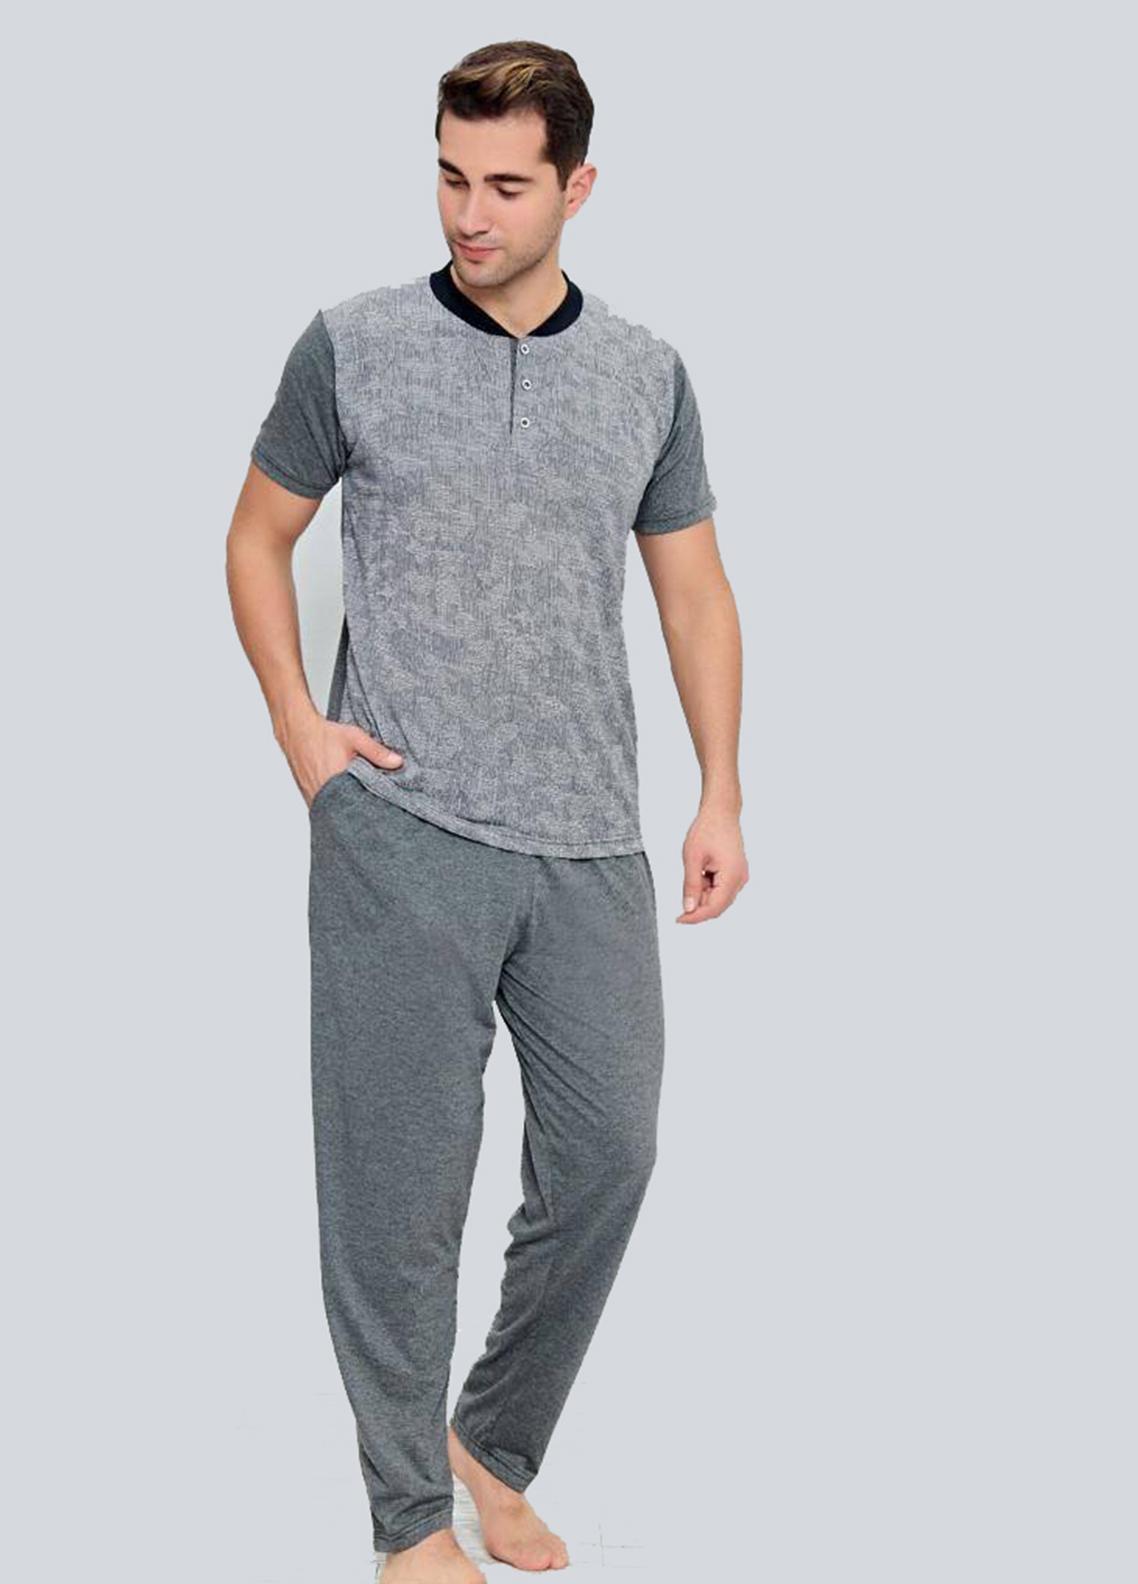 Cotton 2 Piece for Men Home Wear SU21MH D-08 L-Grey